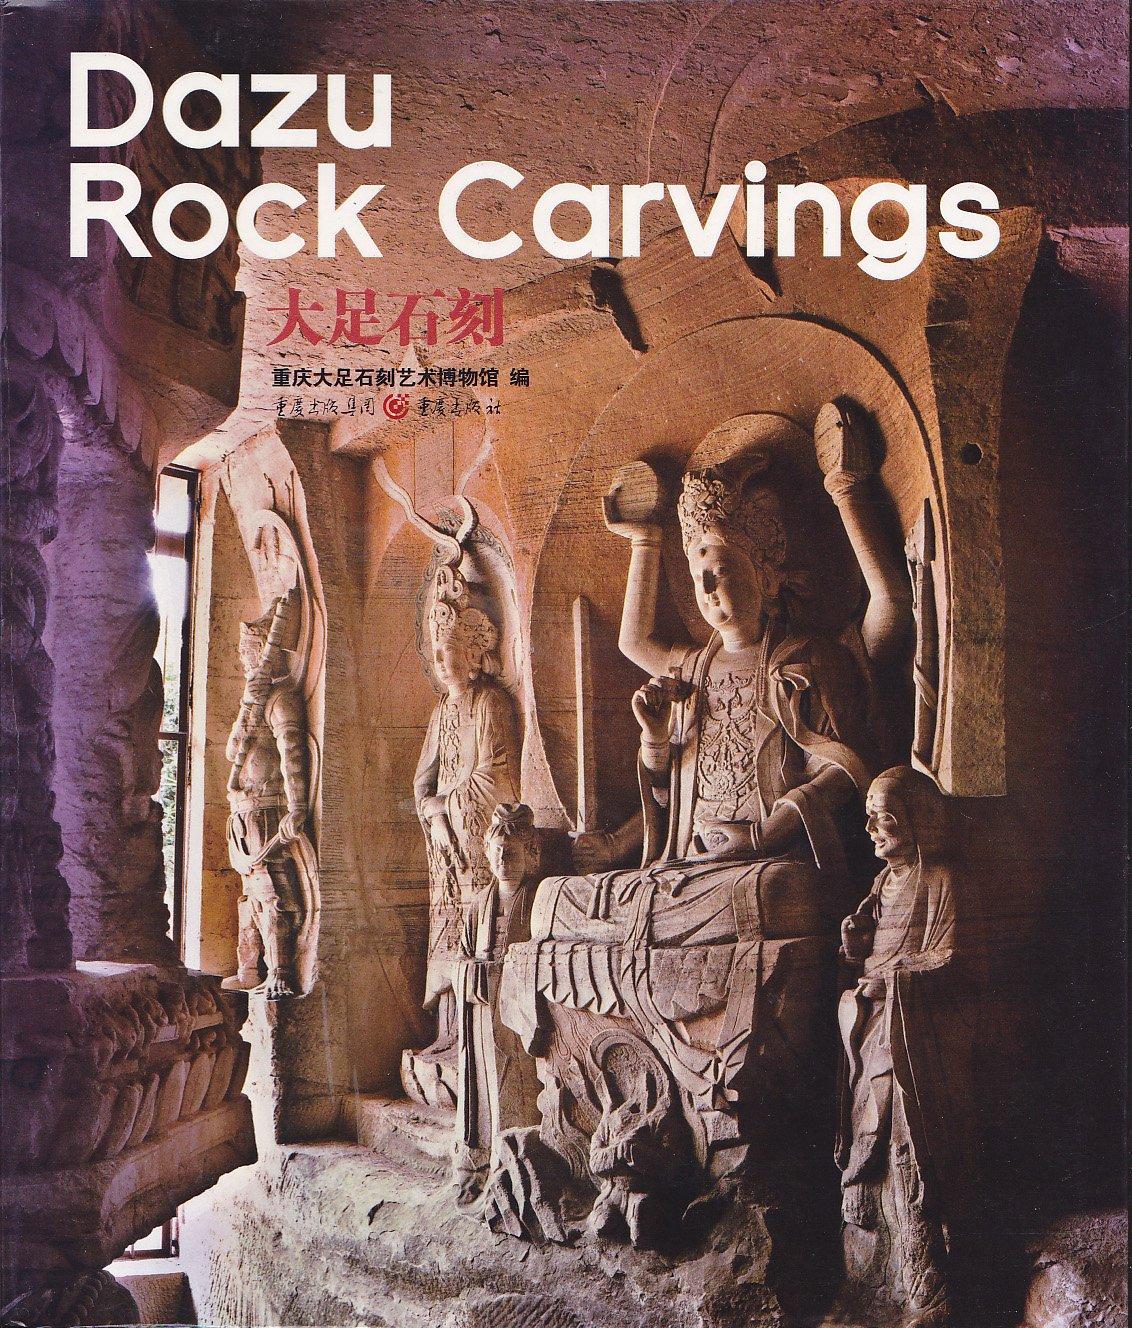 Dazu rock carvings: d. shike: 9787229030506: amazon.com: books